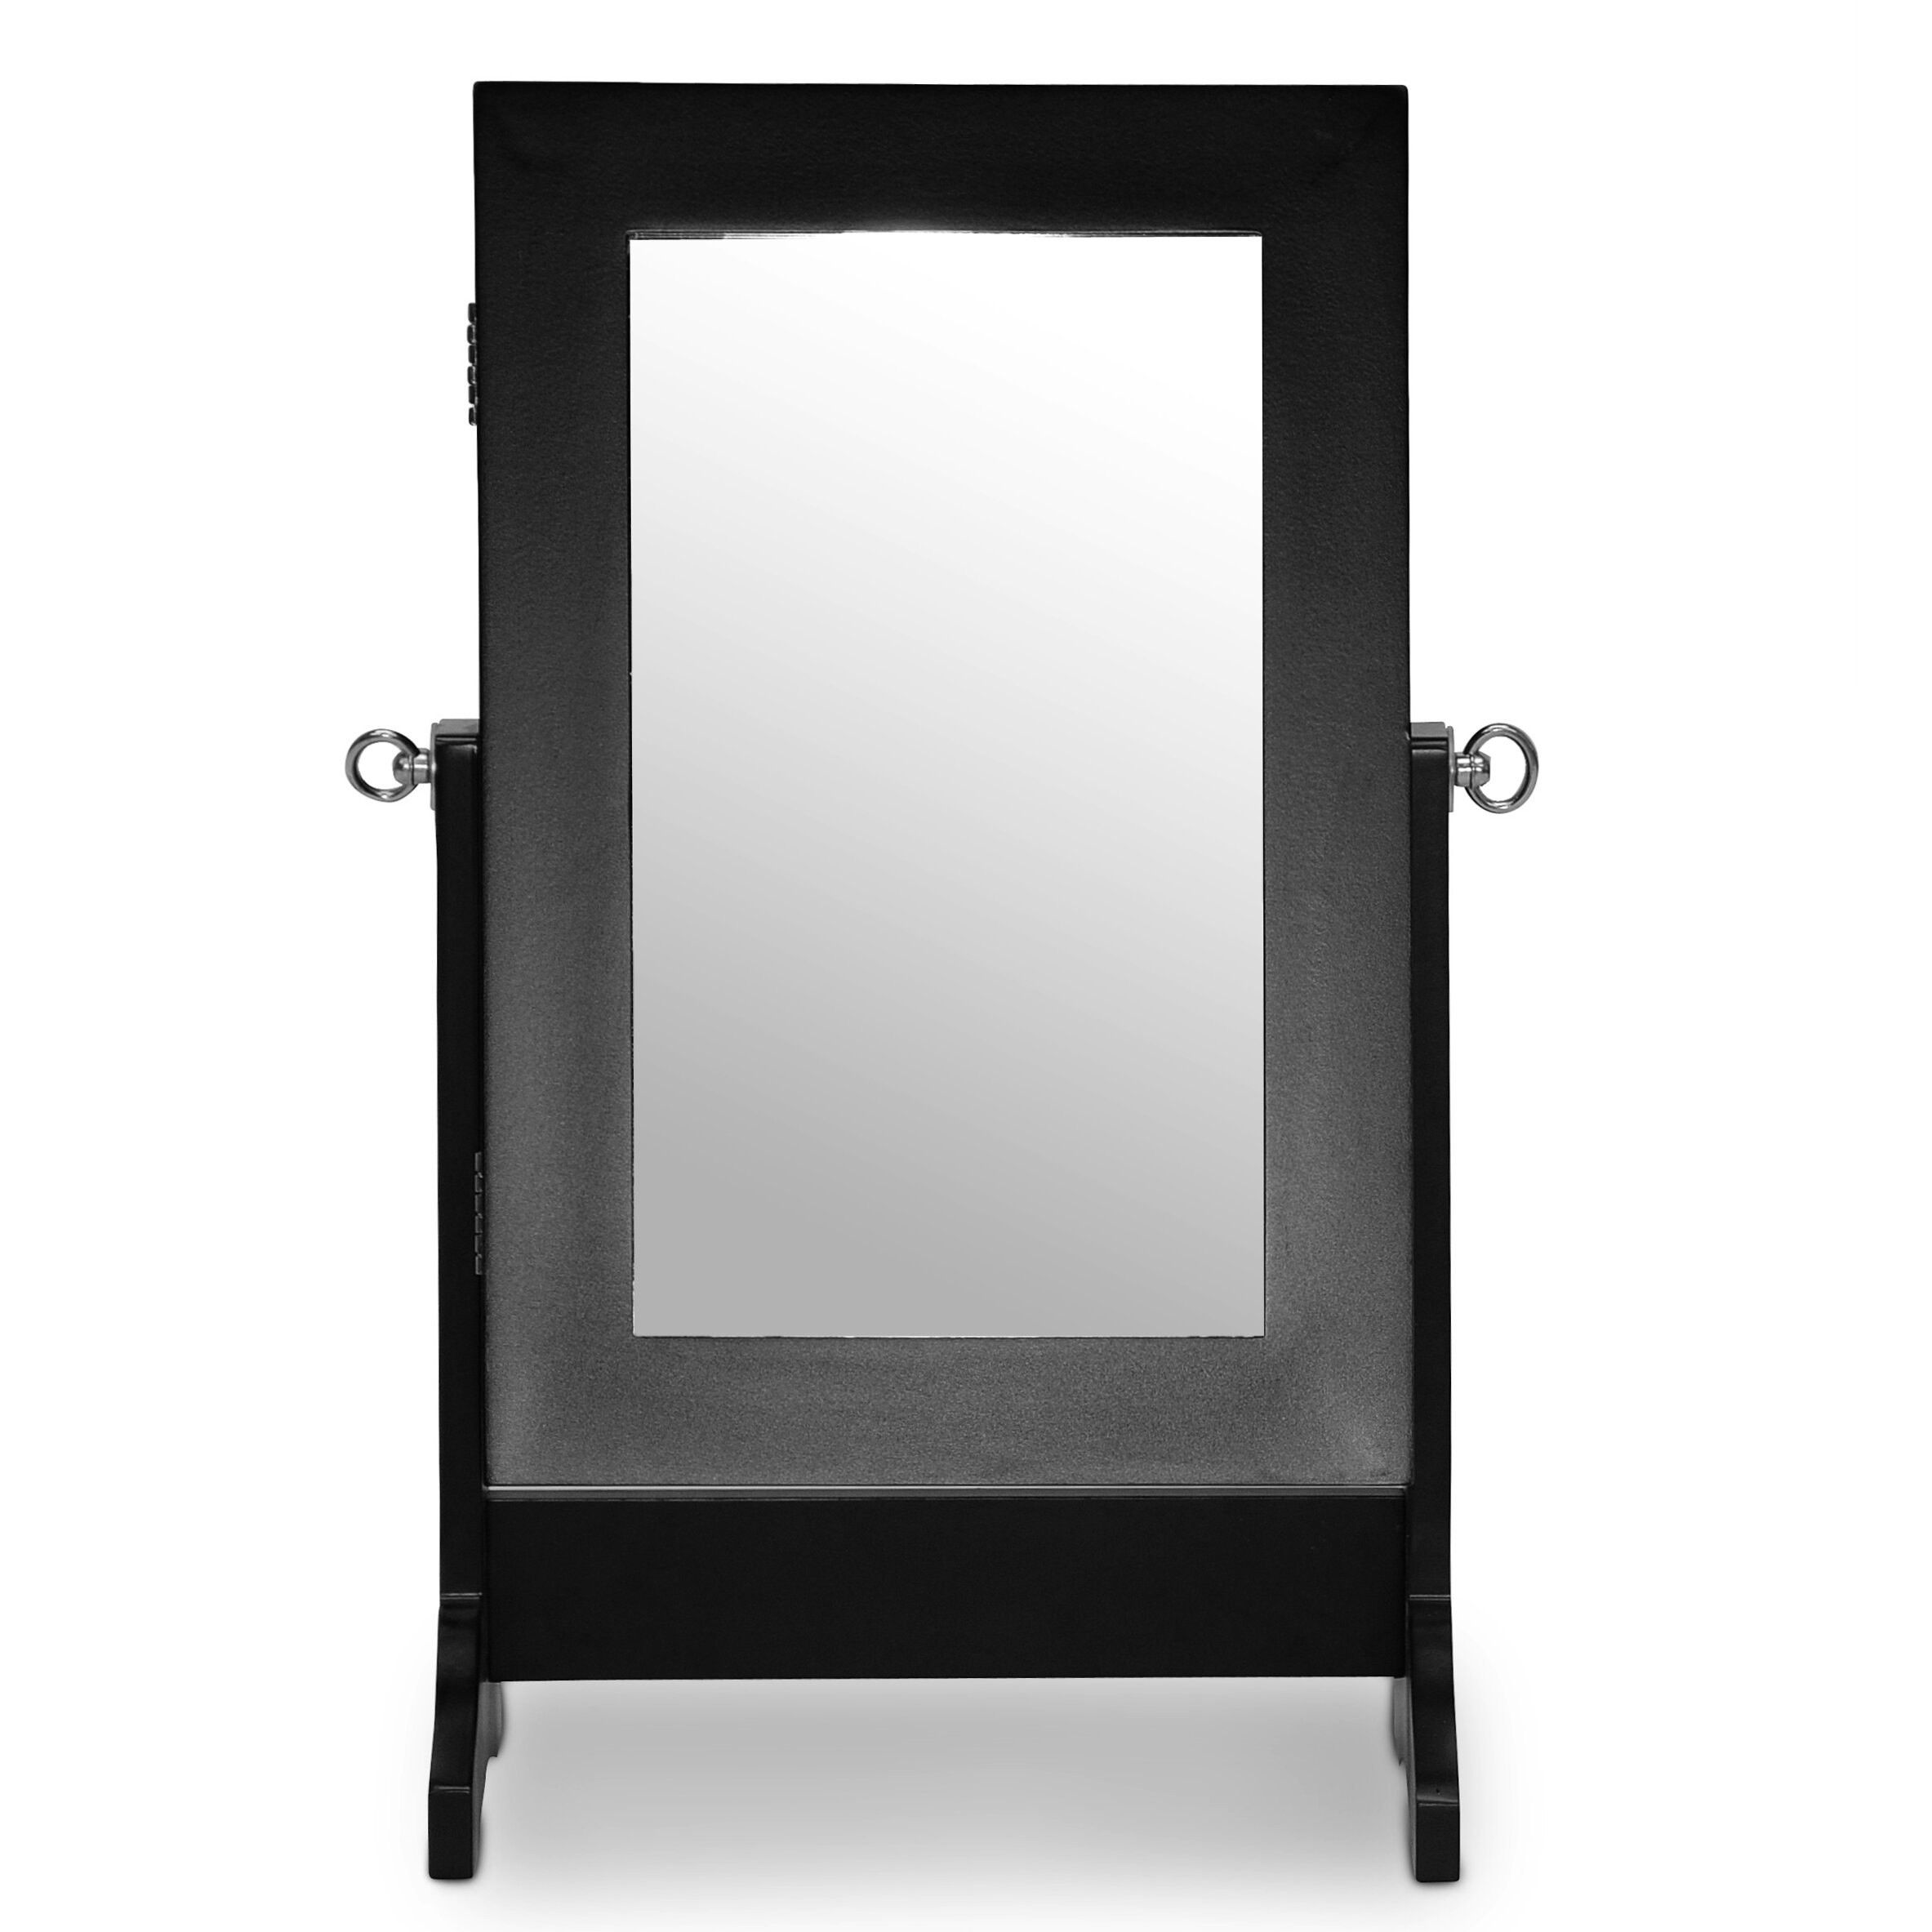 Wholesale interiors baxton studio tabletop mirror for Wholesale mirrors